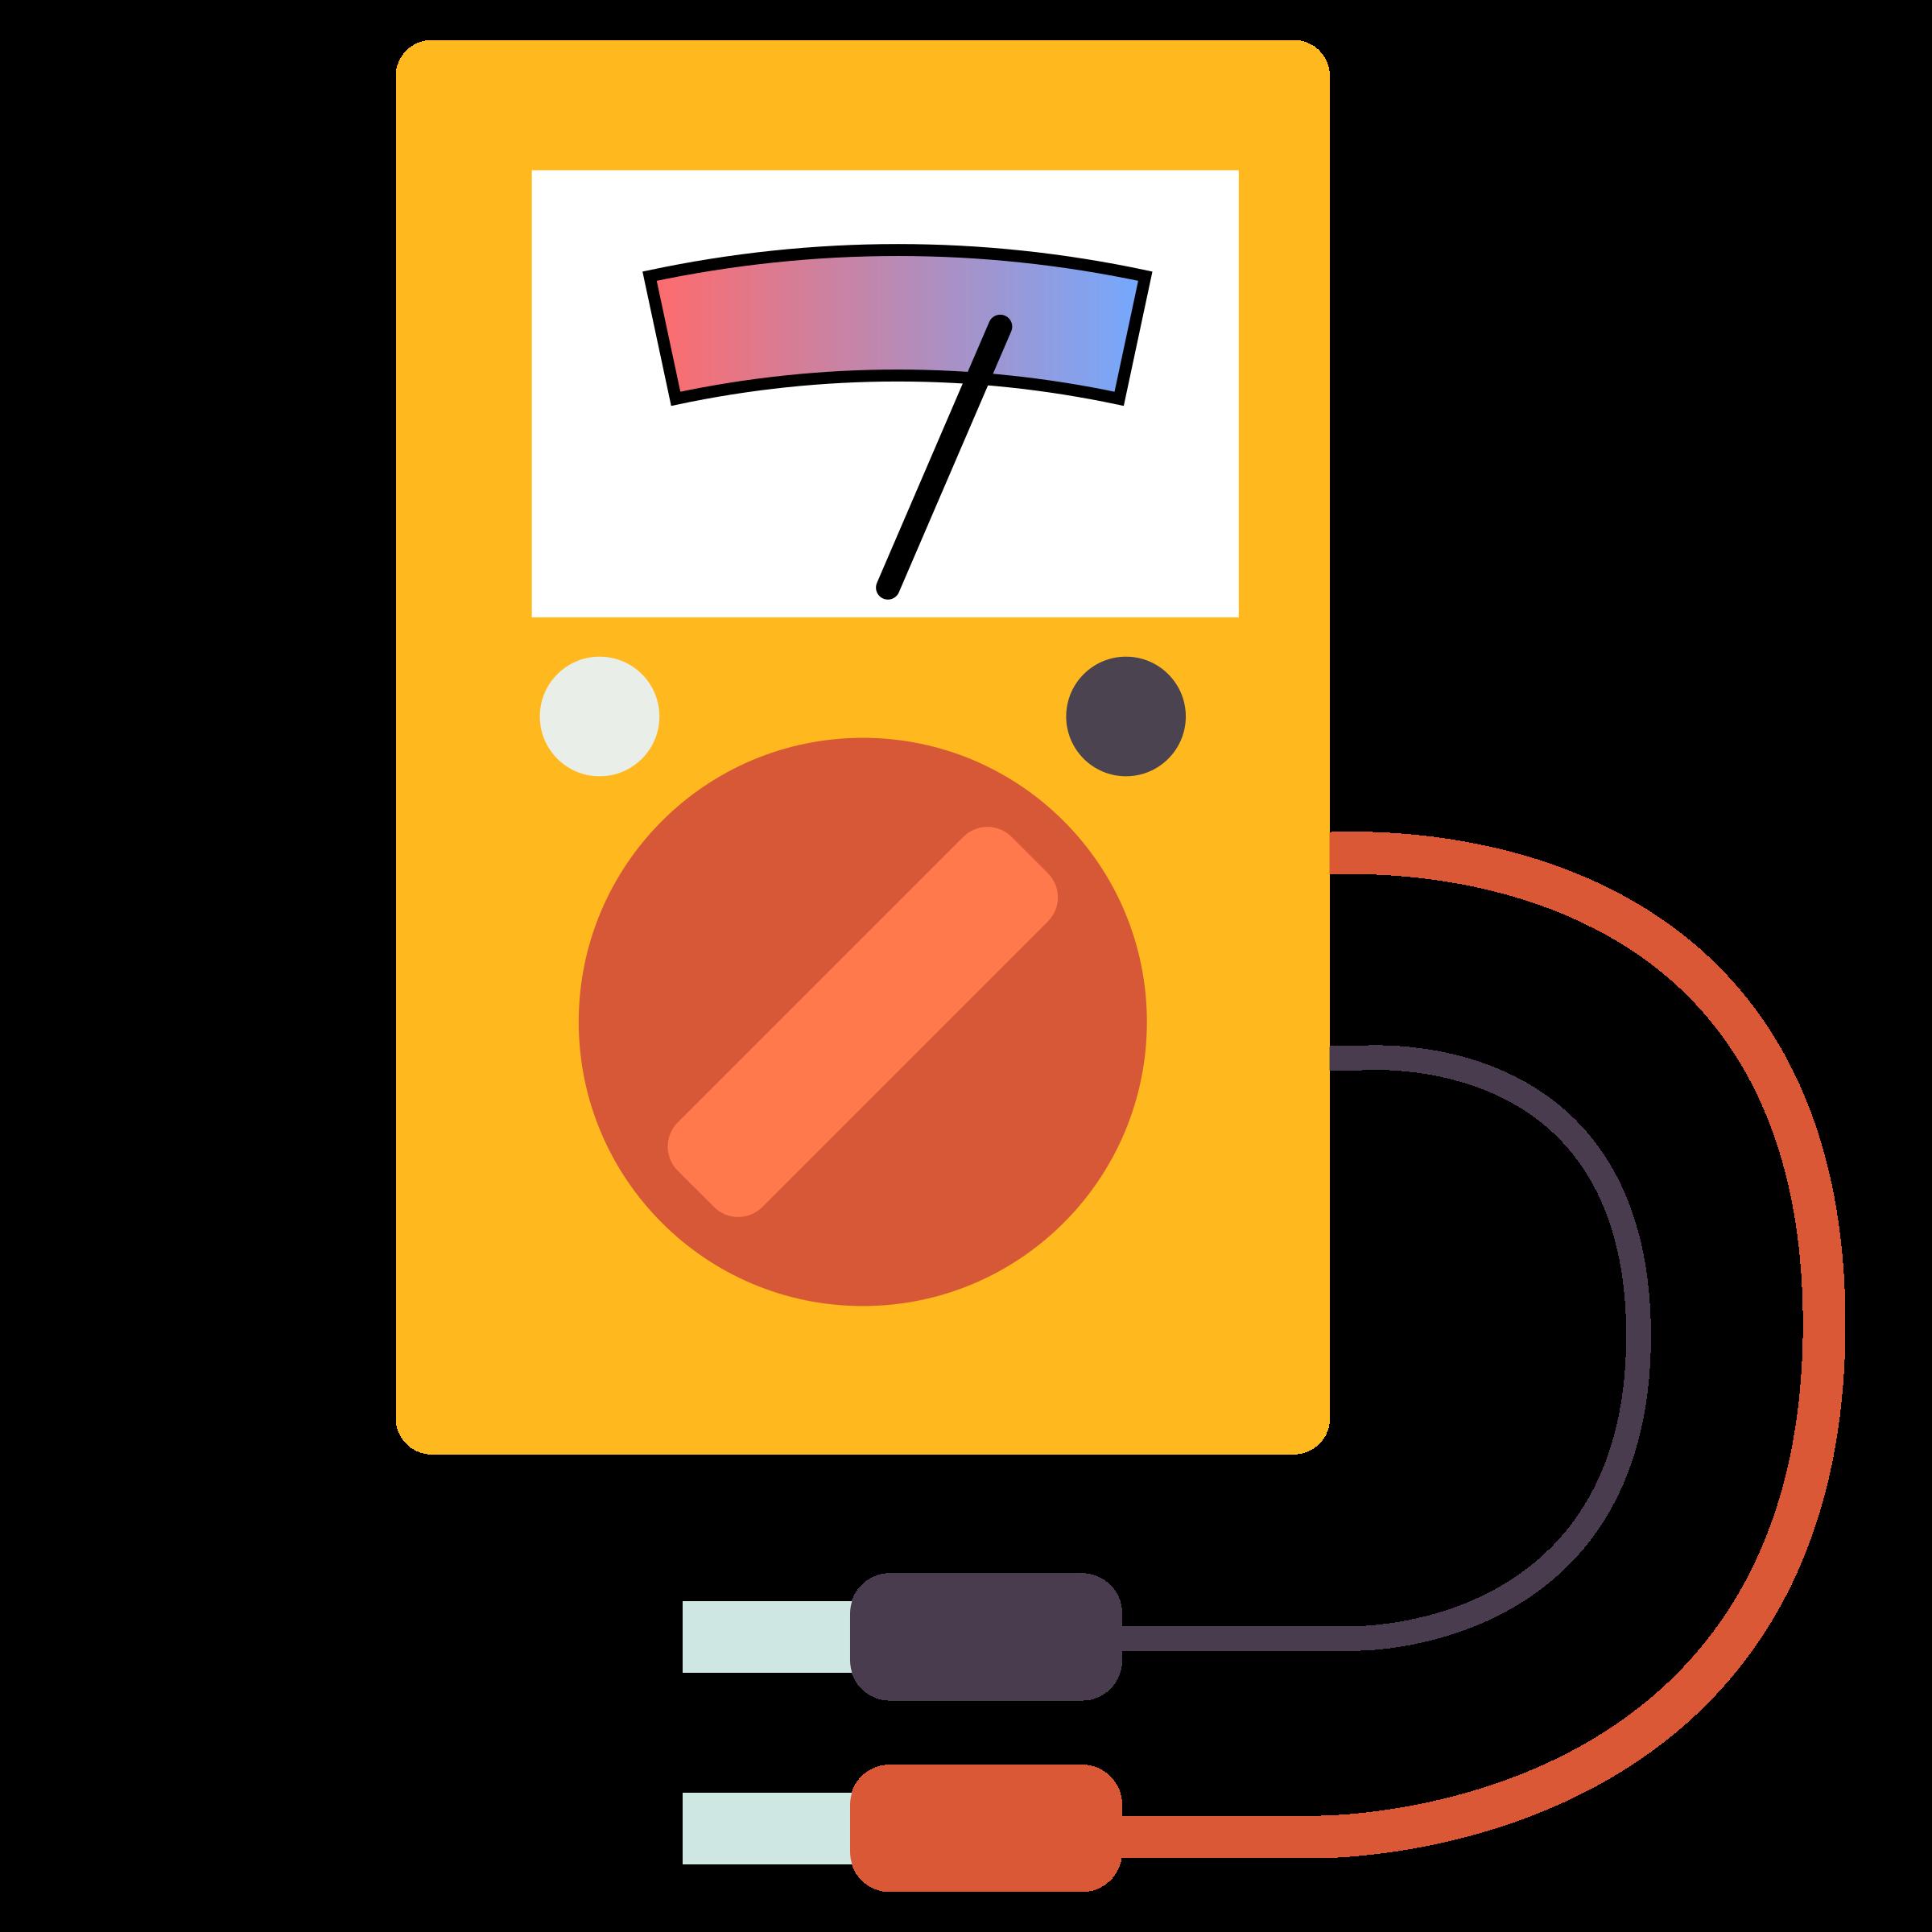 Multimeter Clip Art : Clipart multimeter flat design